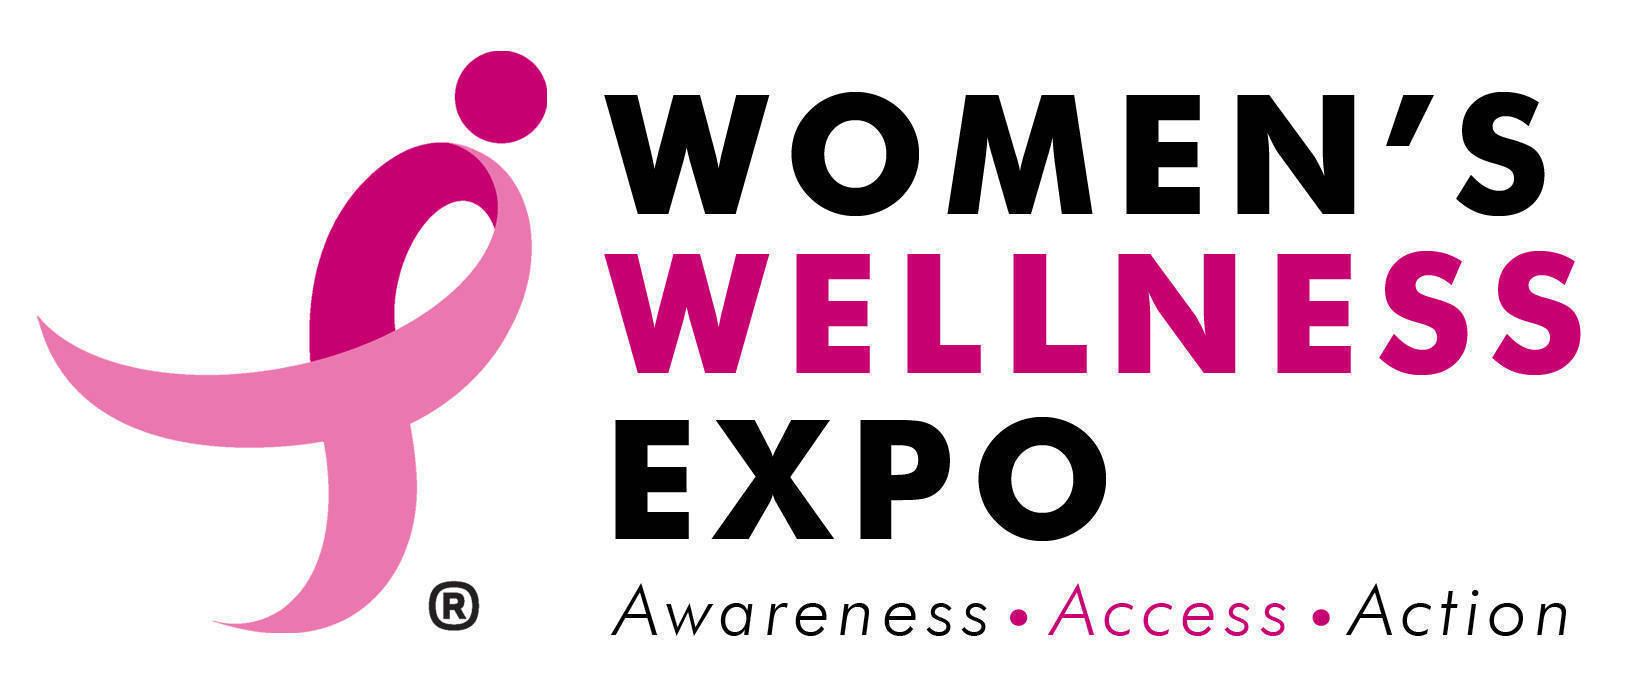 Susan G  Komen North Jersey to Present Free Women's Wellness